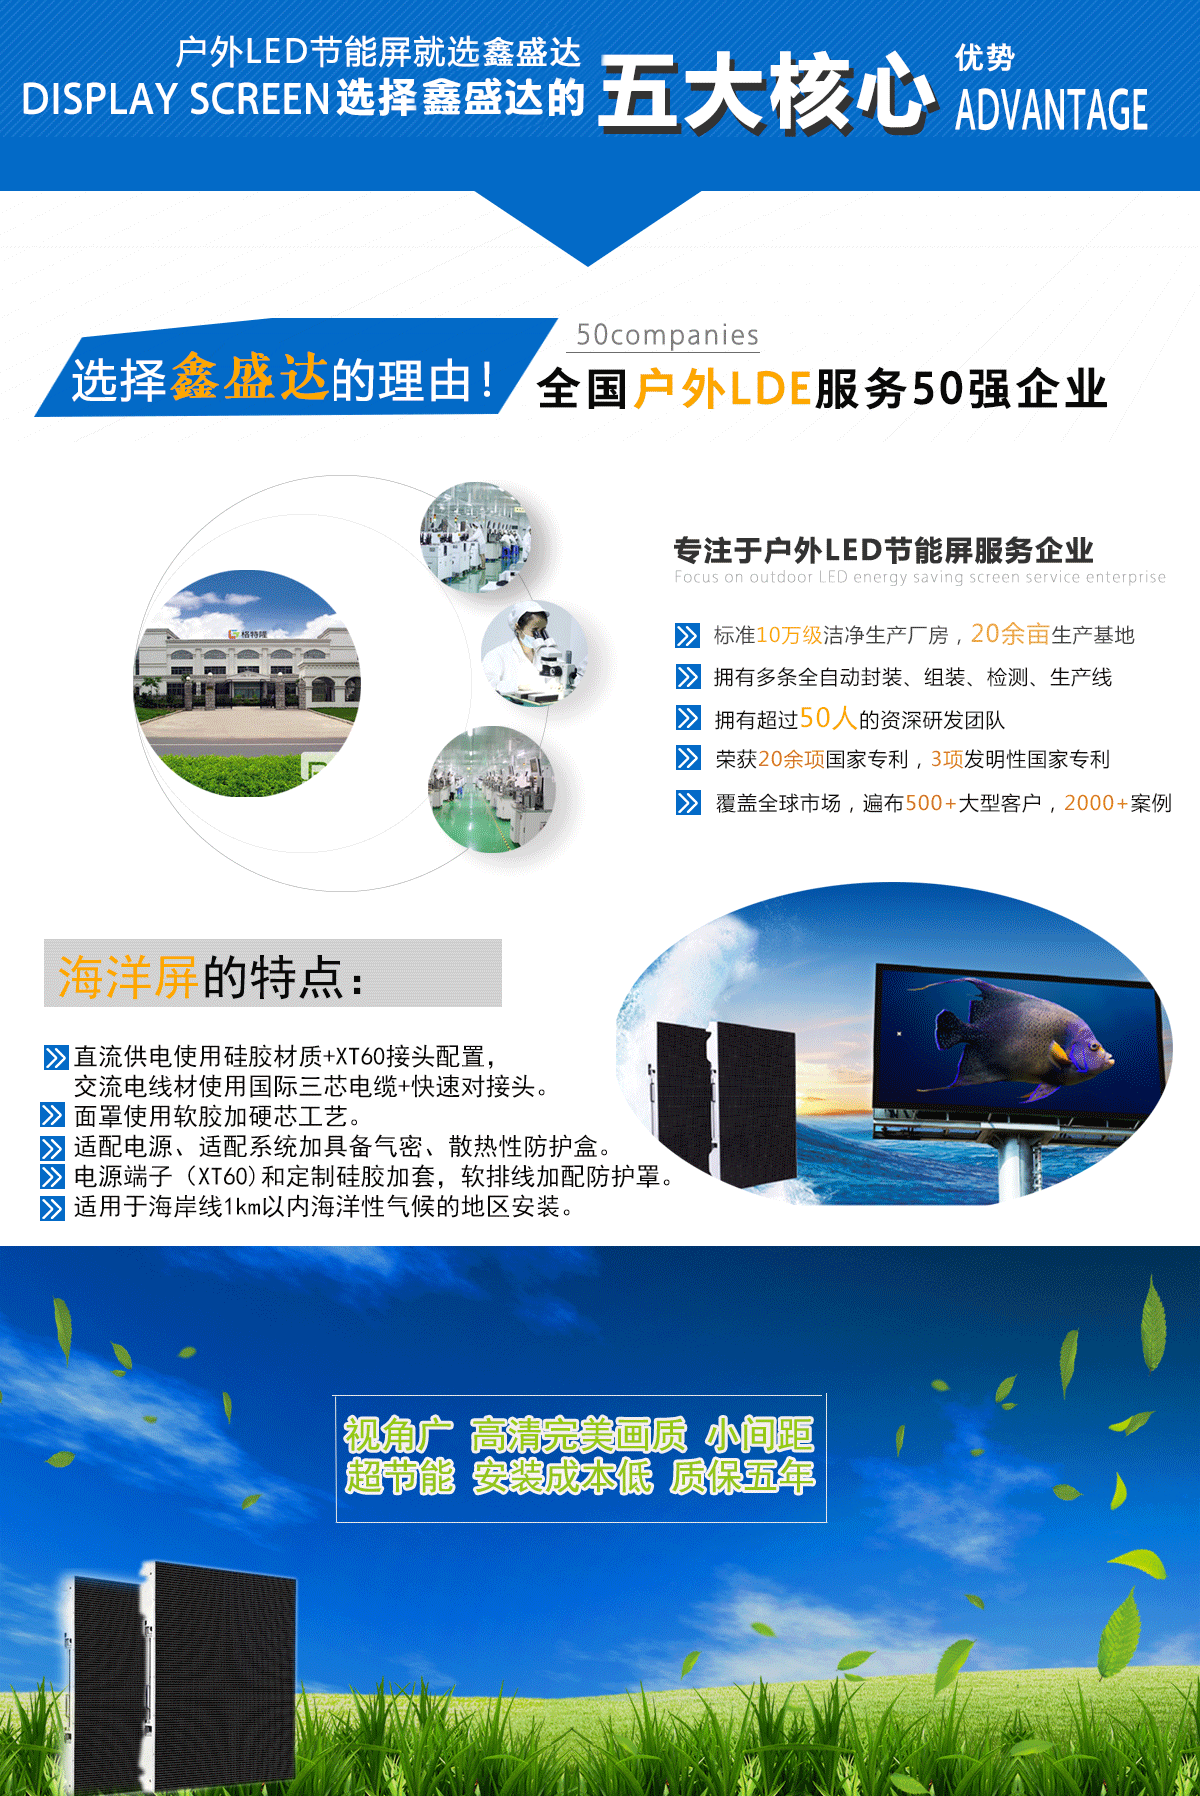 P10節能壓鑄系列-鑫盛達(寧夏)光電技術發展有限公司